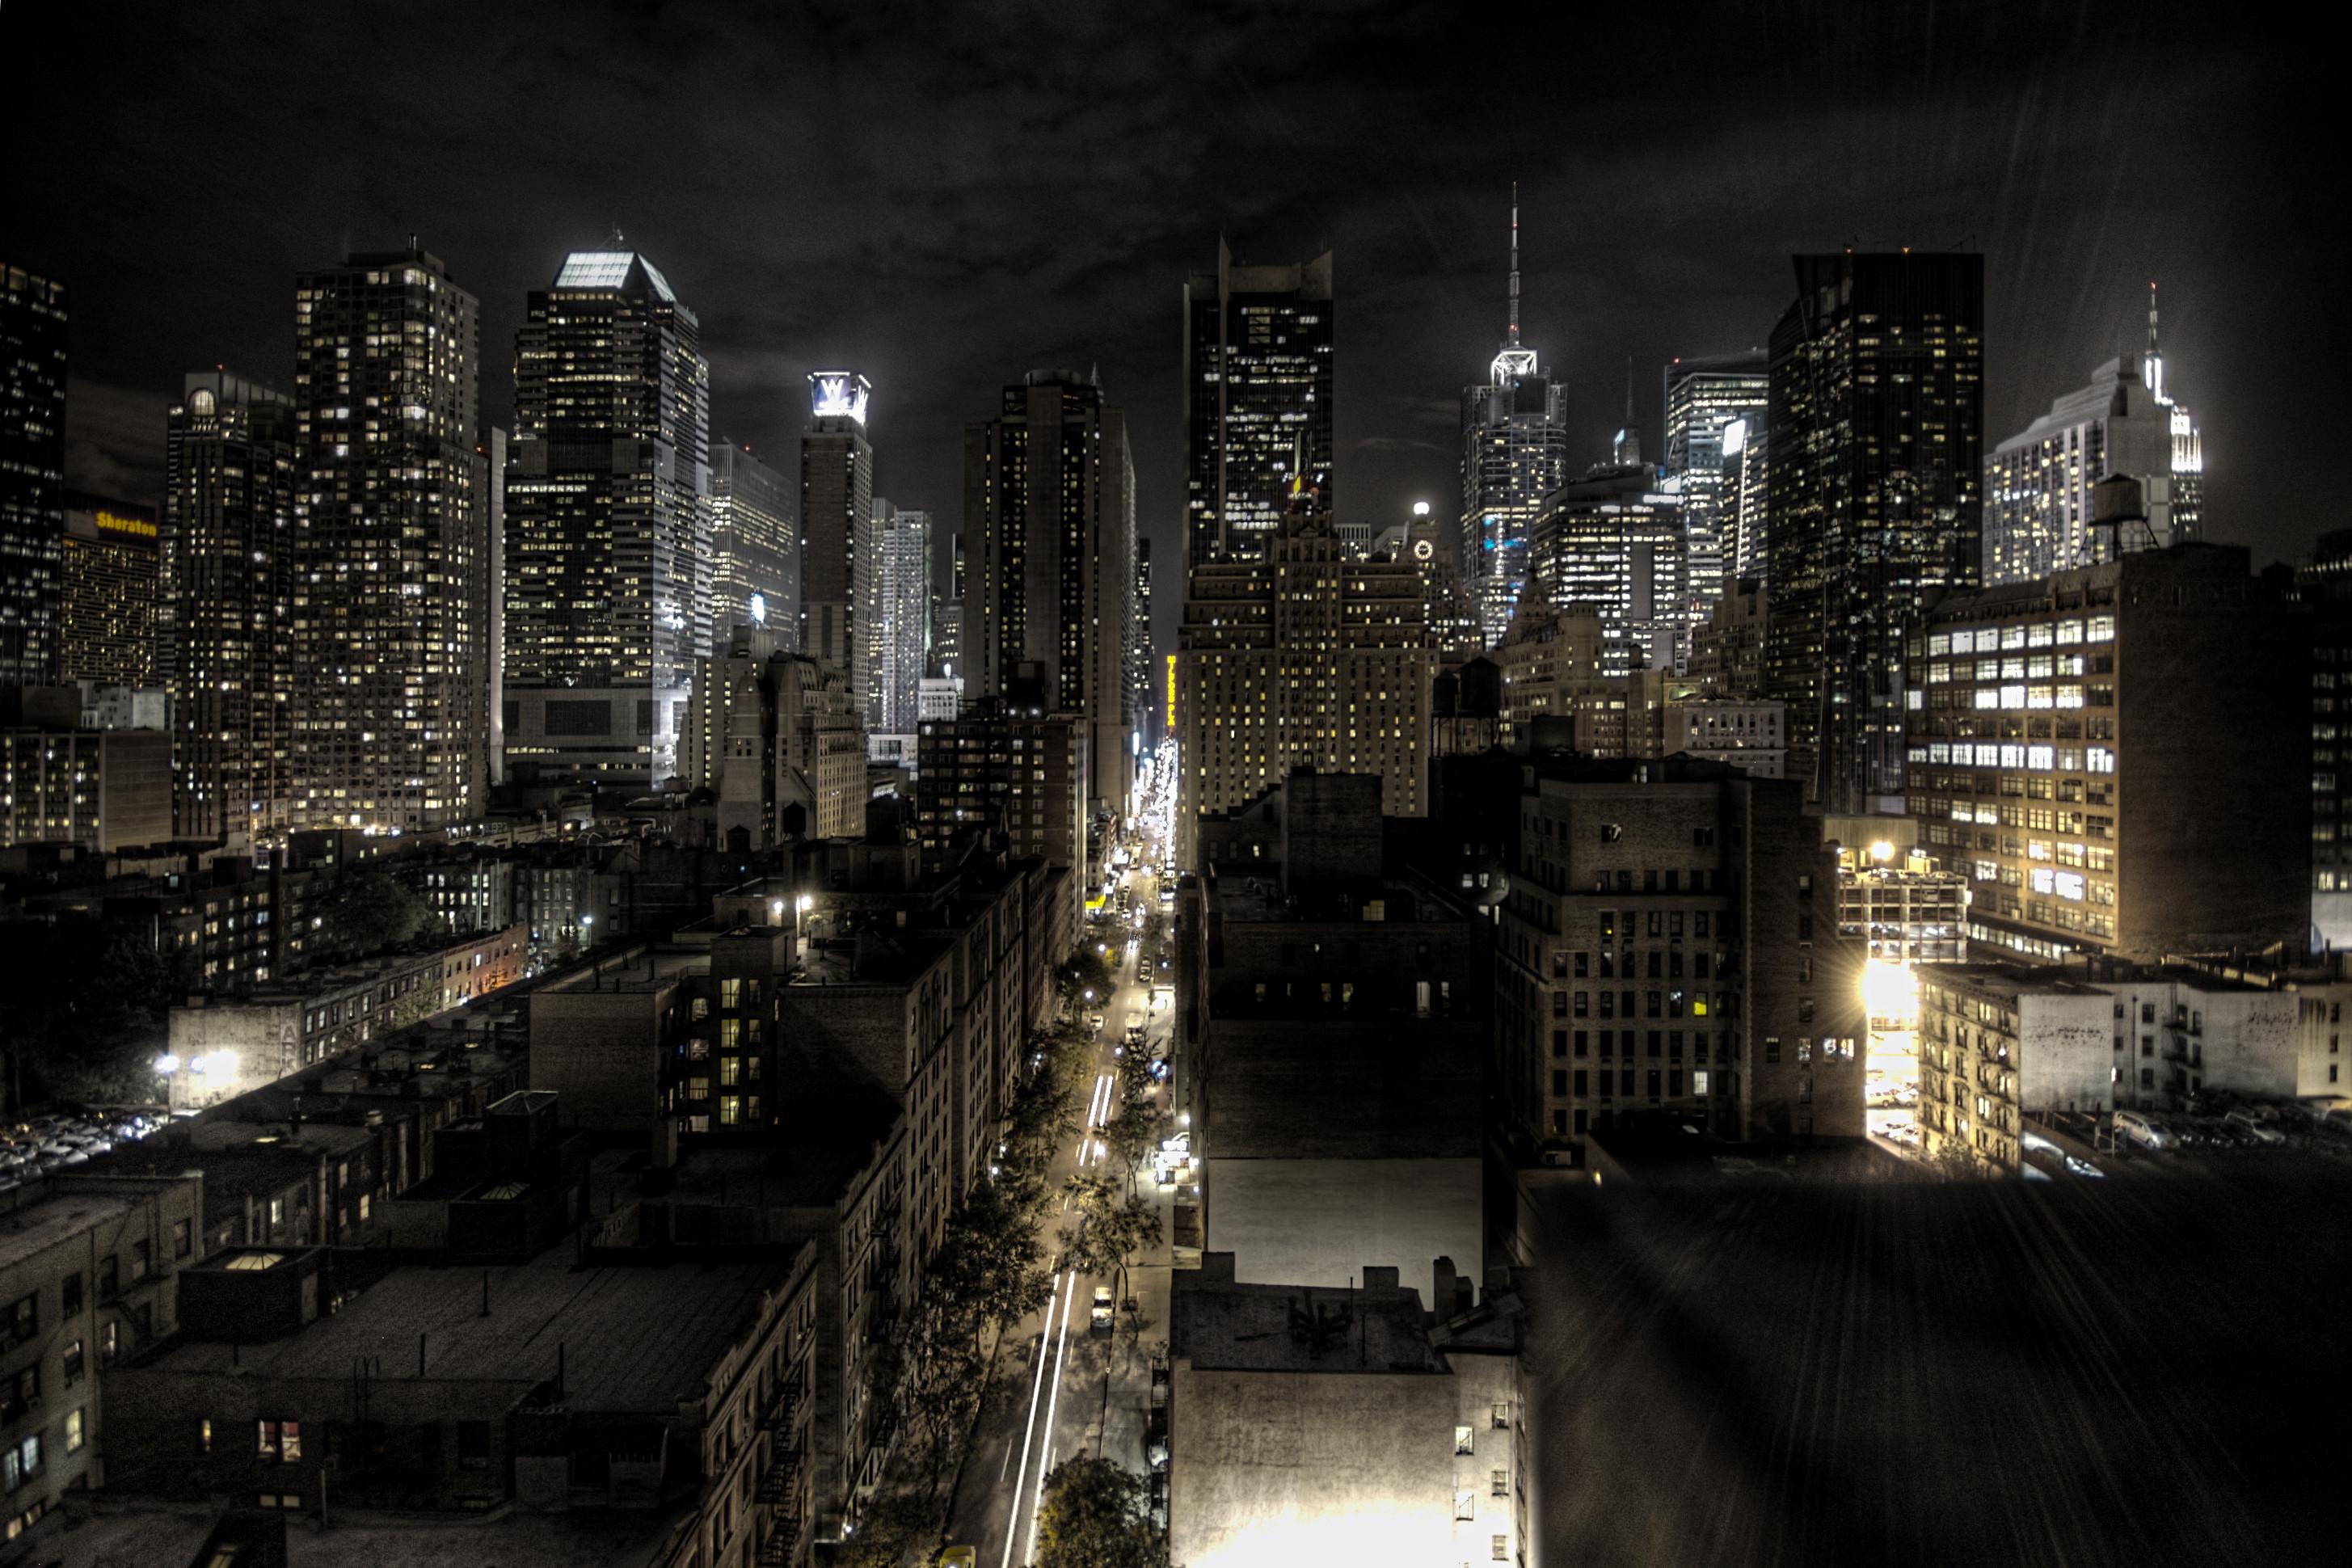 2048x2048 Preview Wallpaper Brooklyn Bridge New York City Nyc Usa Manhattan East